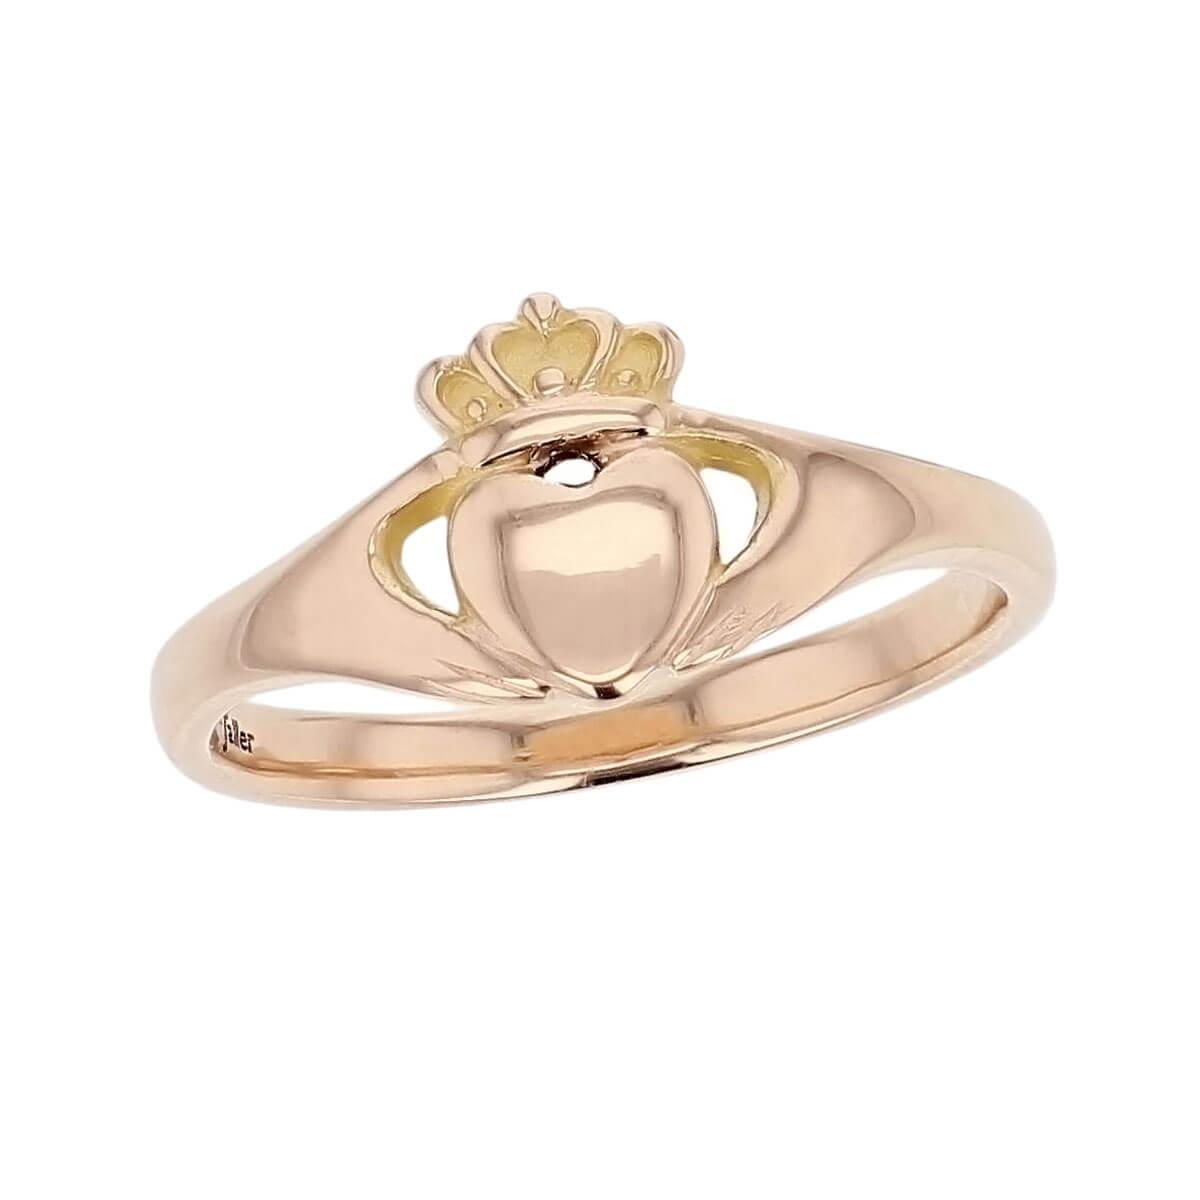 Faller Claddagh, 18ct rose gold, Irish, love, loyalty & friendship, hands, heart & crown, dress ring, ladies